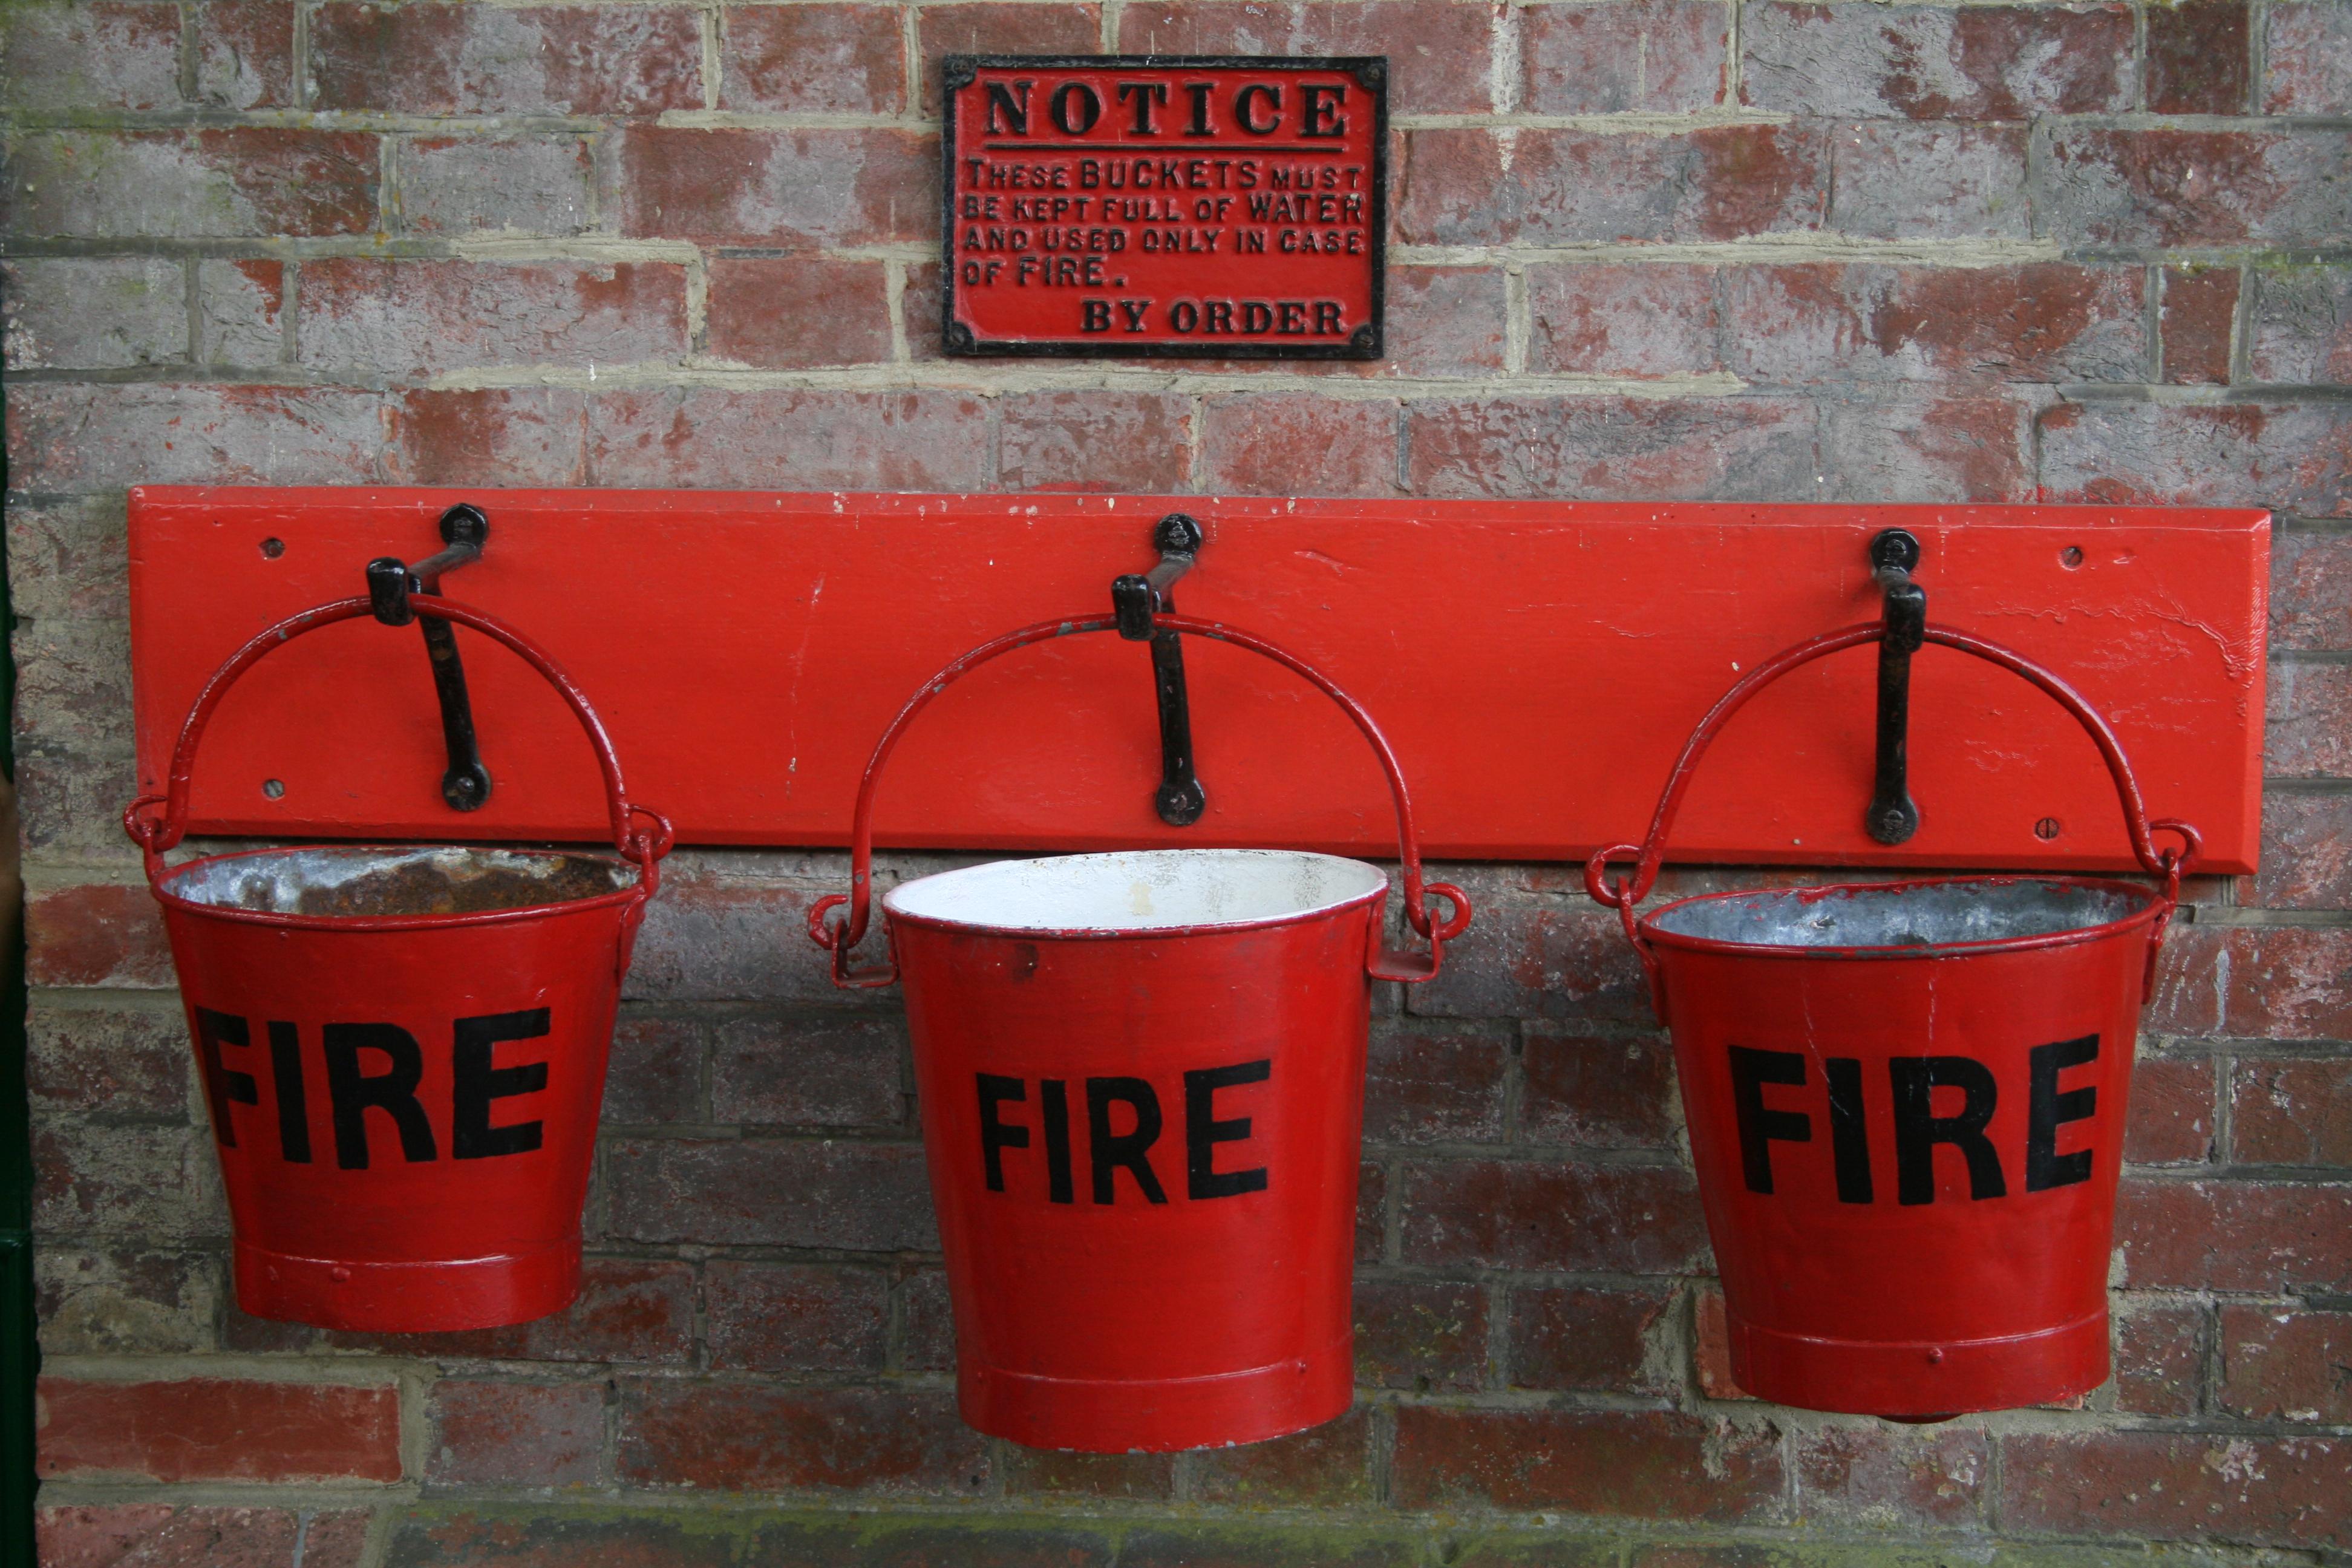 Fire buckets